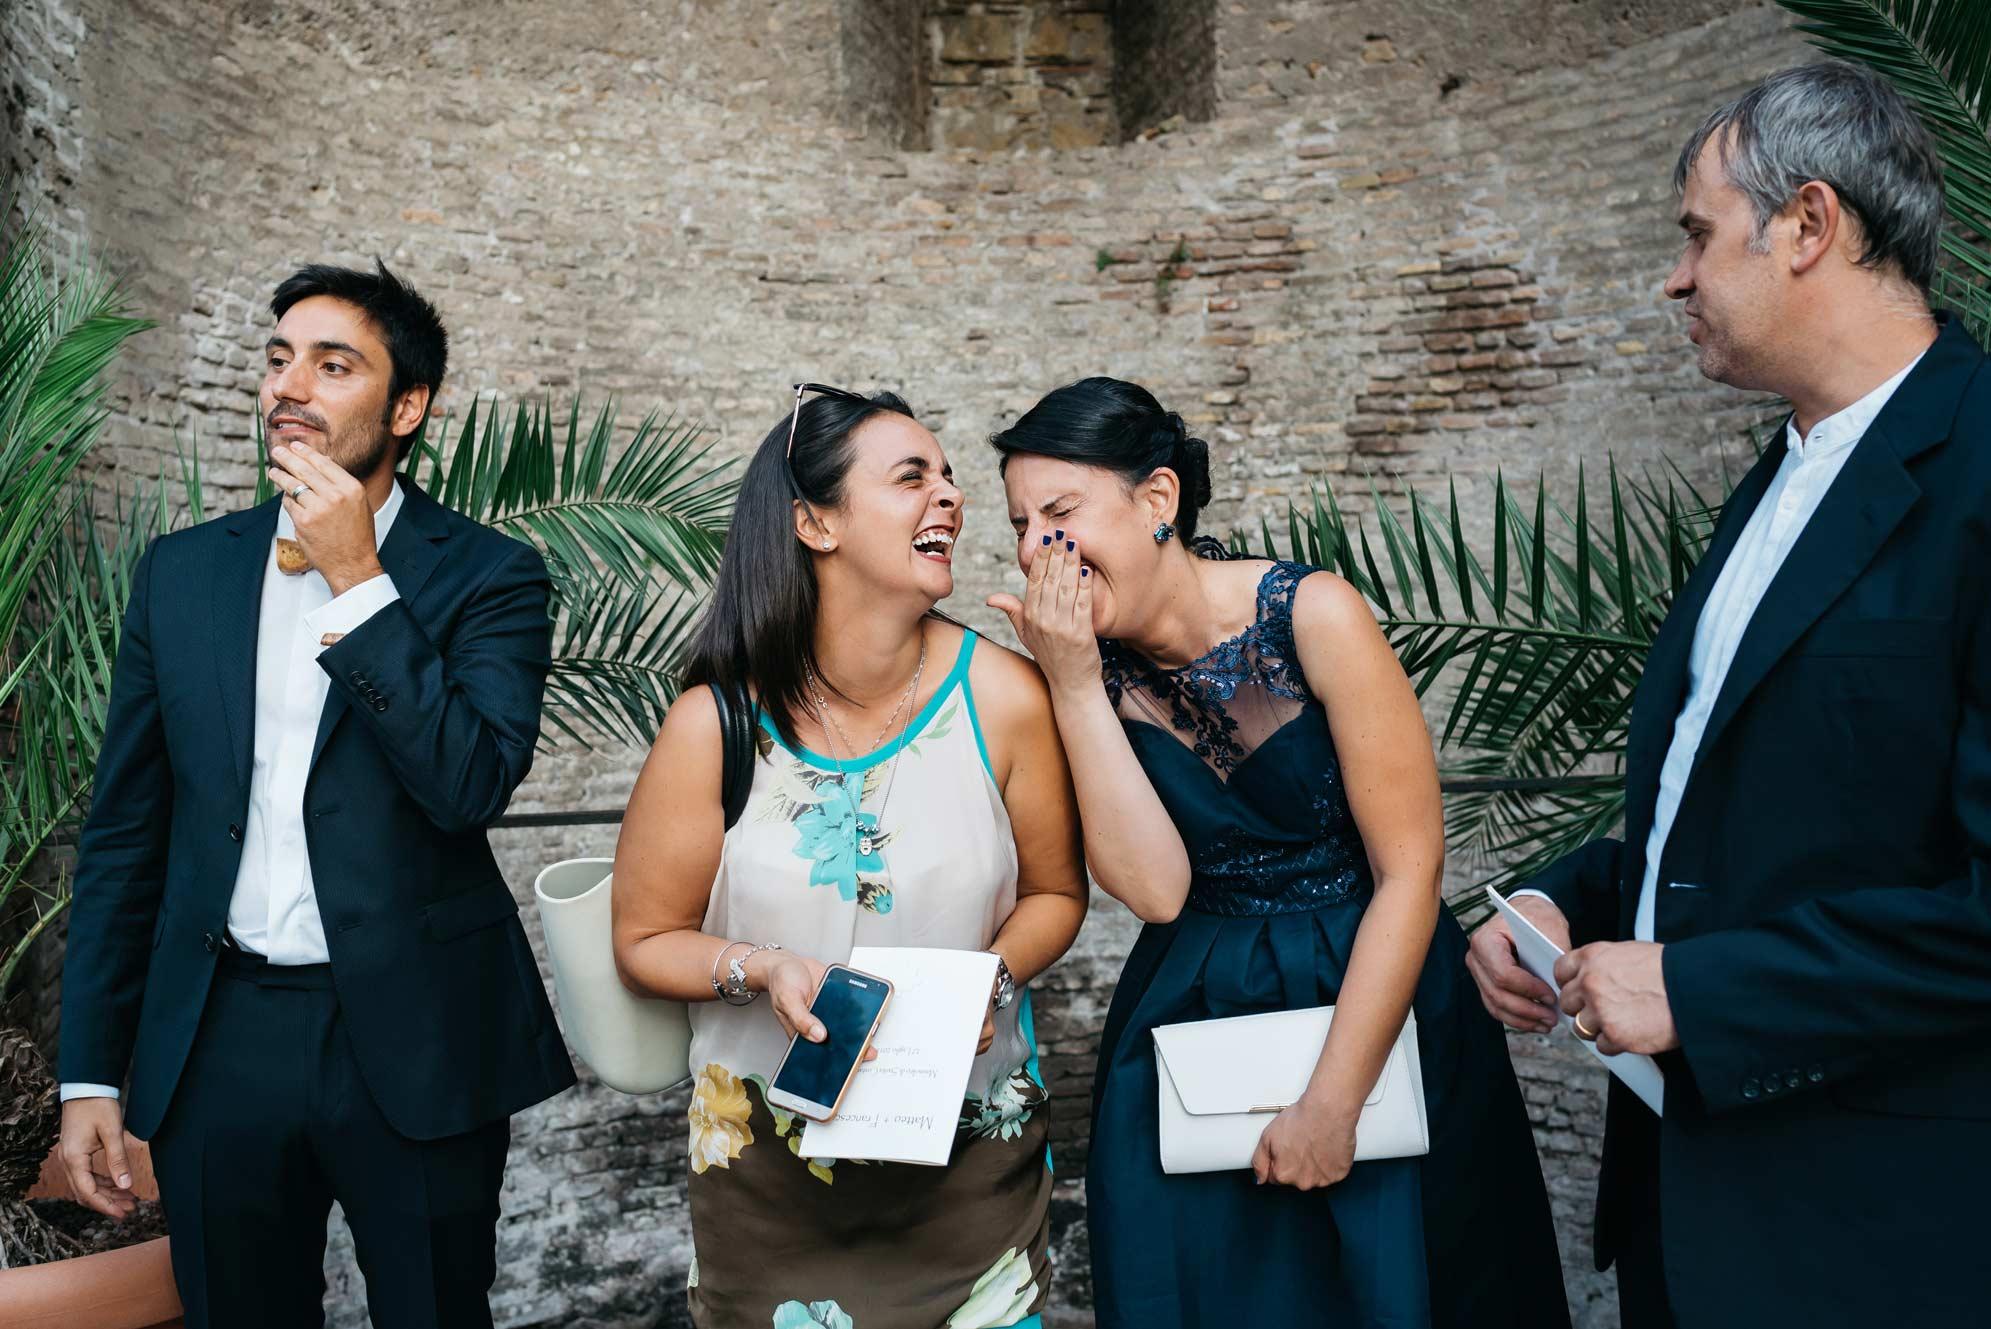 Matrimonio-Fotografo-Roma-Stile-Reportage-Cerimonia